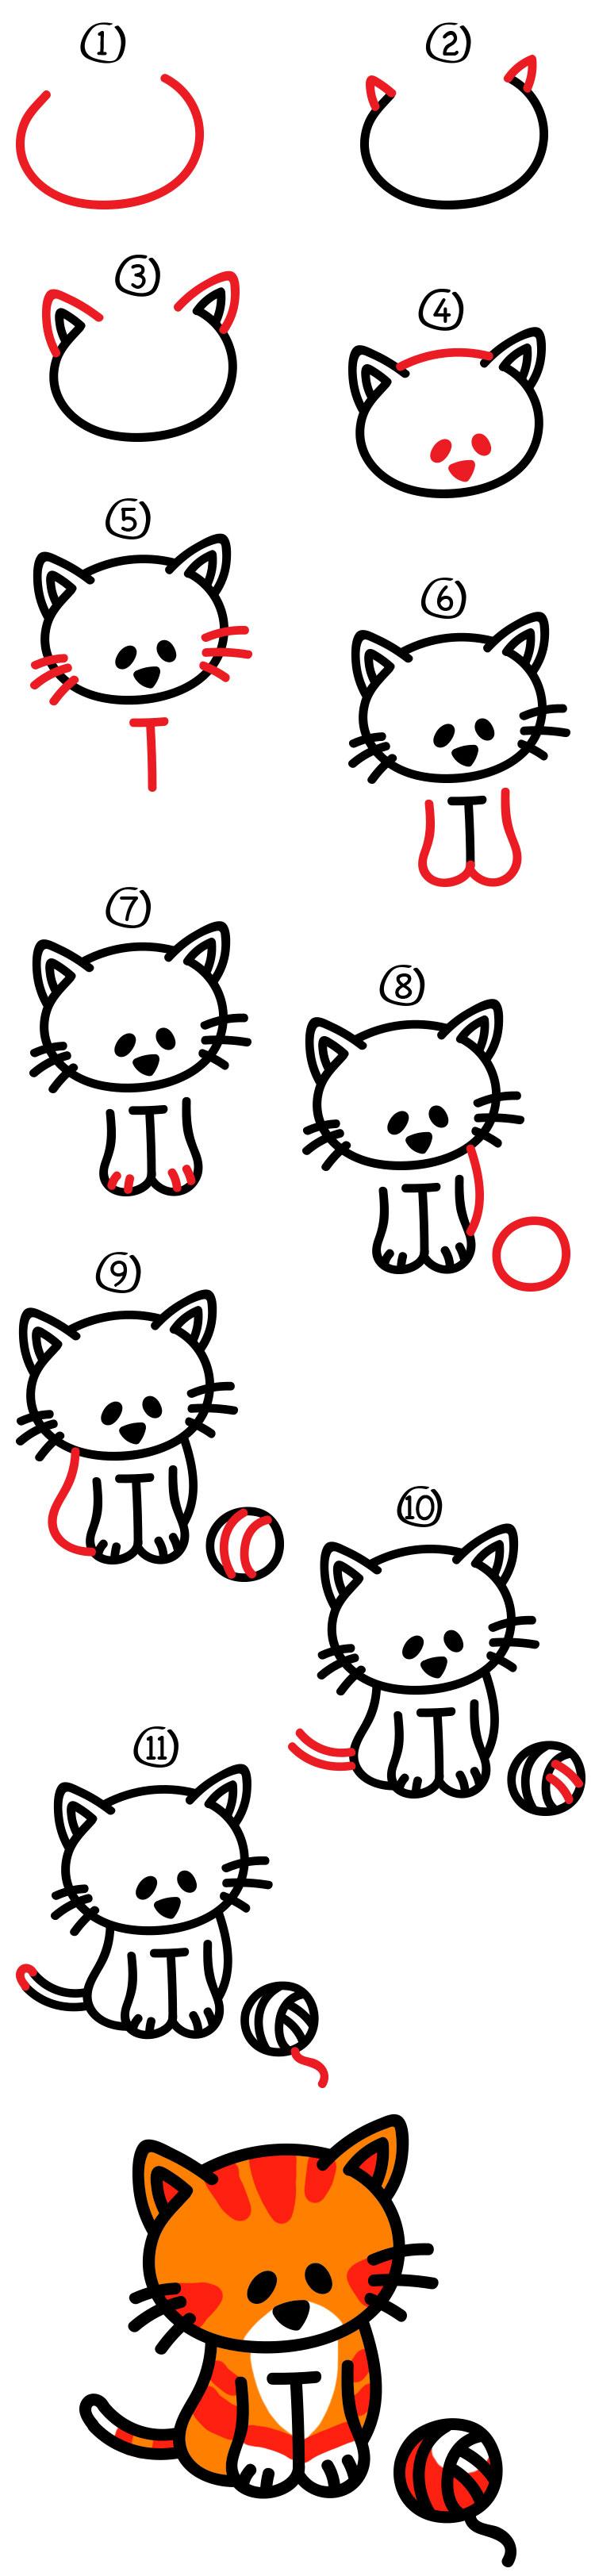 How To Draw A Cartoon Cat Art For Kids Hub Cartoon Cat Cartoon Illustration Art For Kids Hub